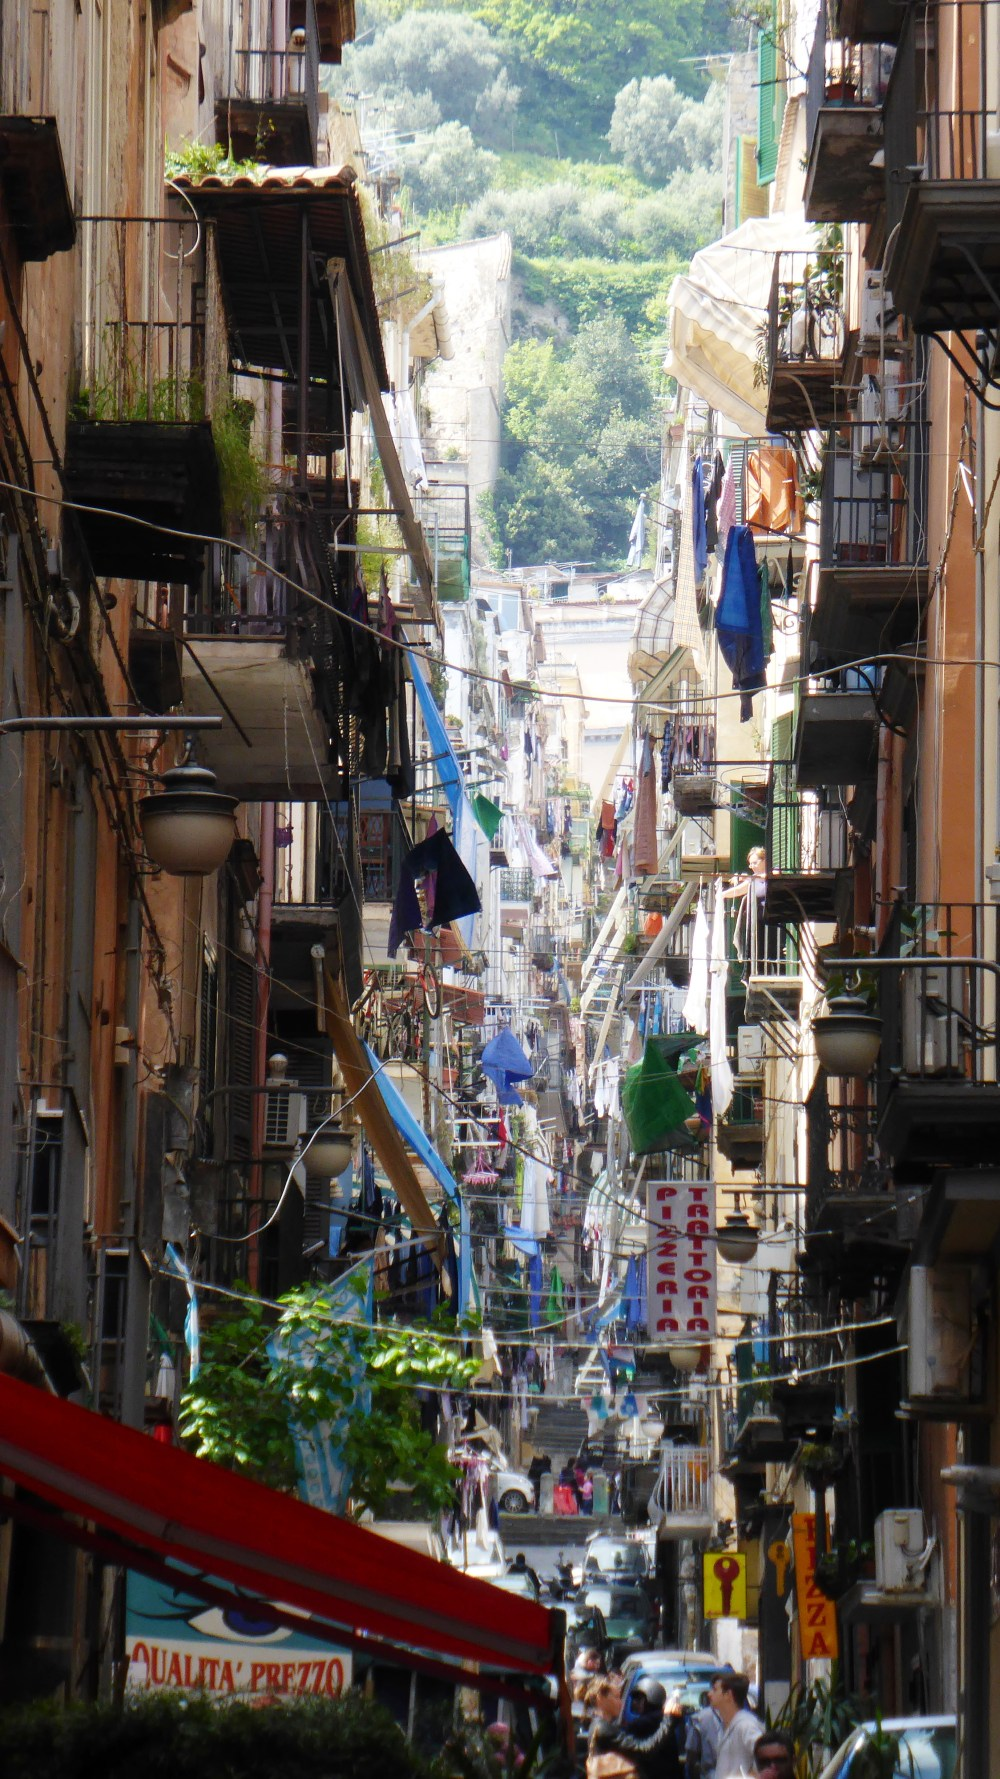 ITALIE  Naples Capri la cte Amalfitaine  danishout